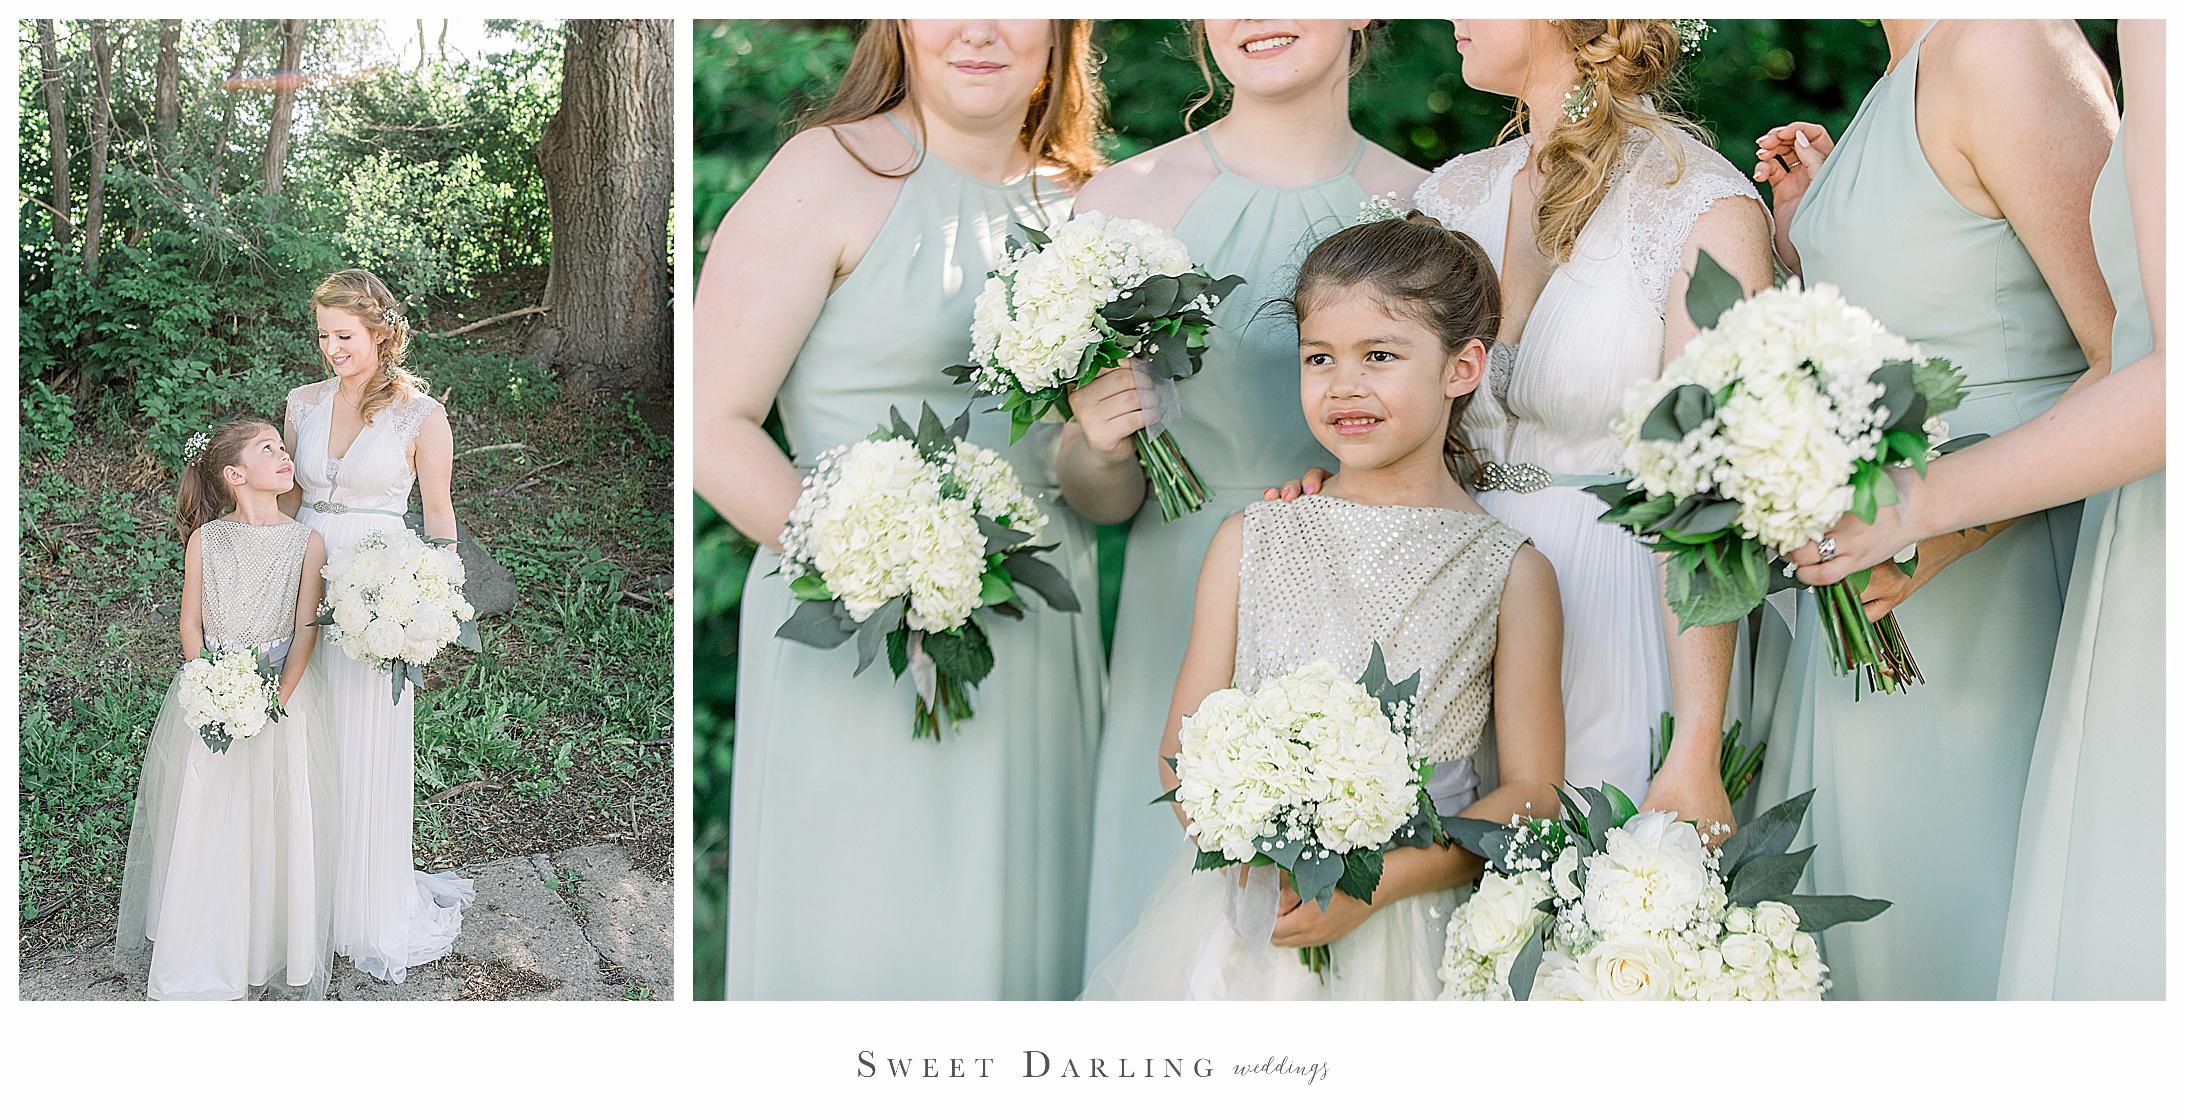 champaign-illinois-boho-summer-wedding-photographer-city-center-sweet-darling-weddings_2333.jpg